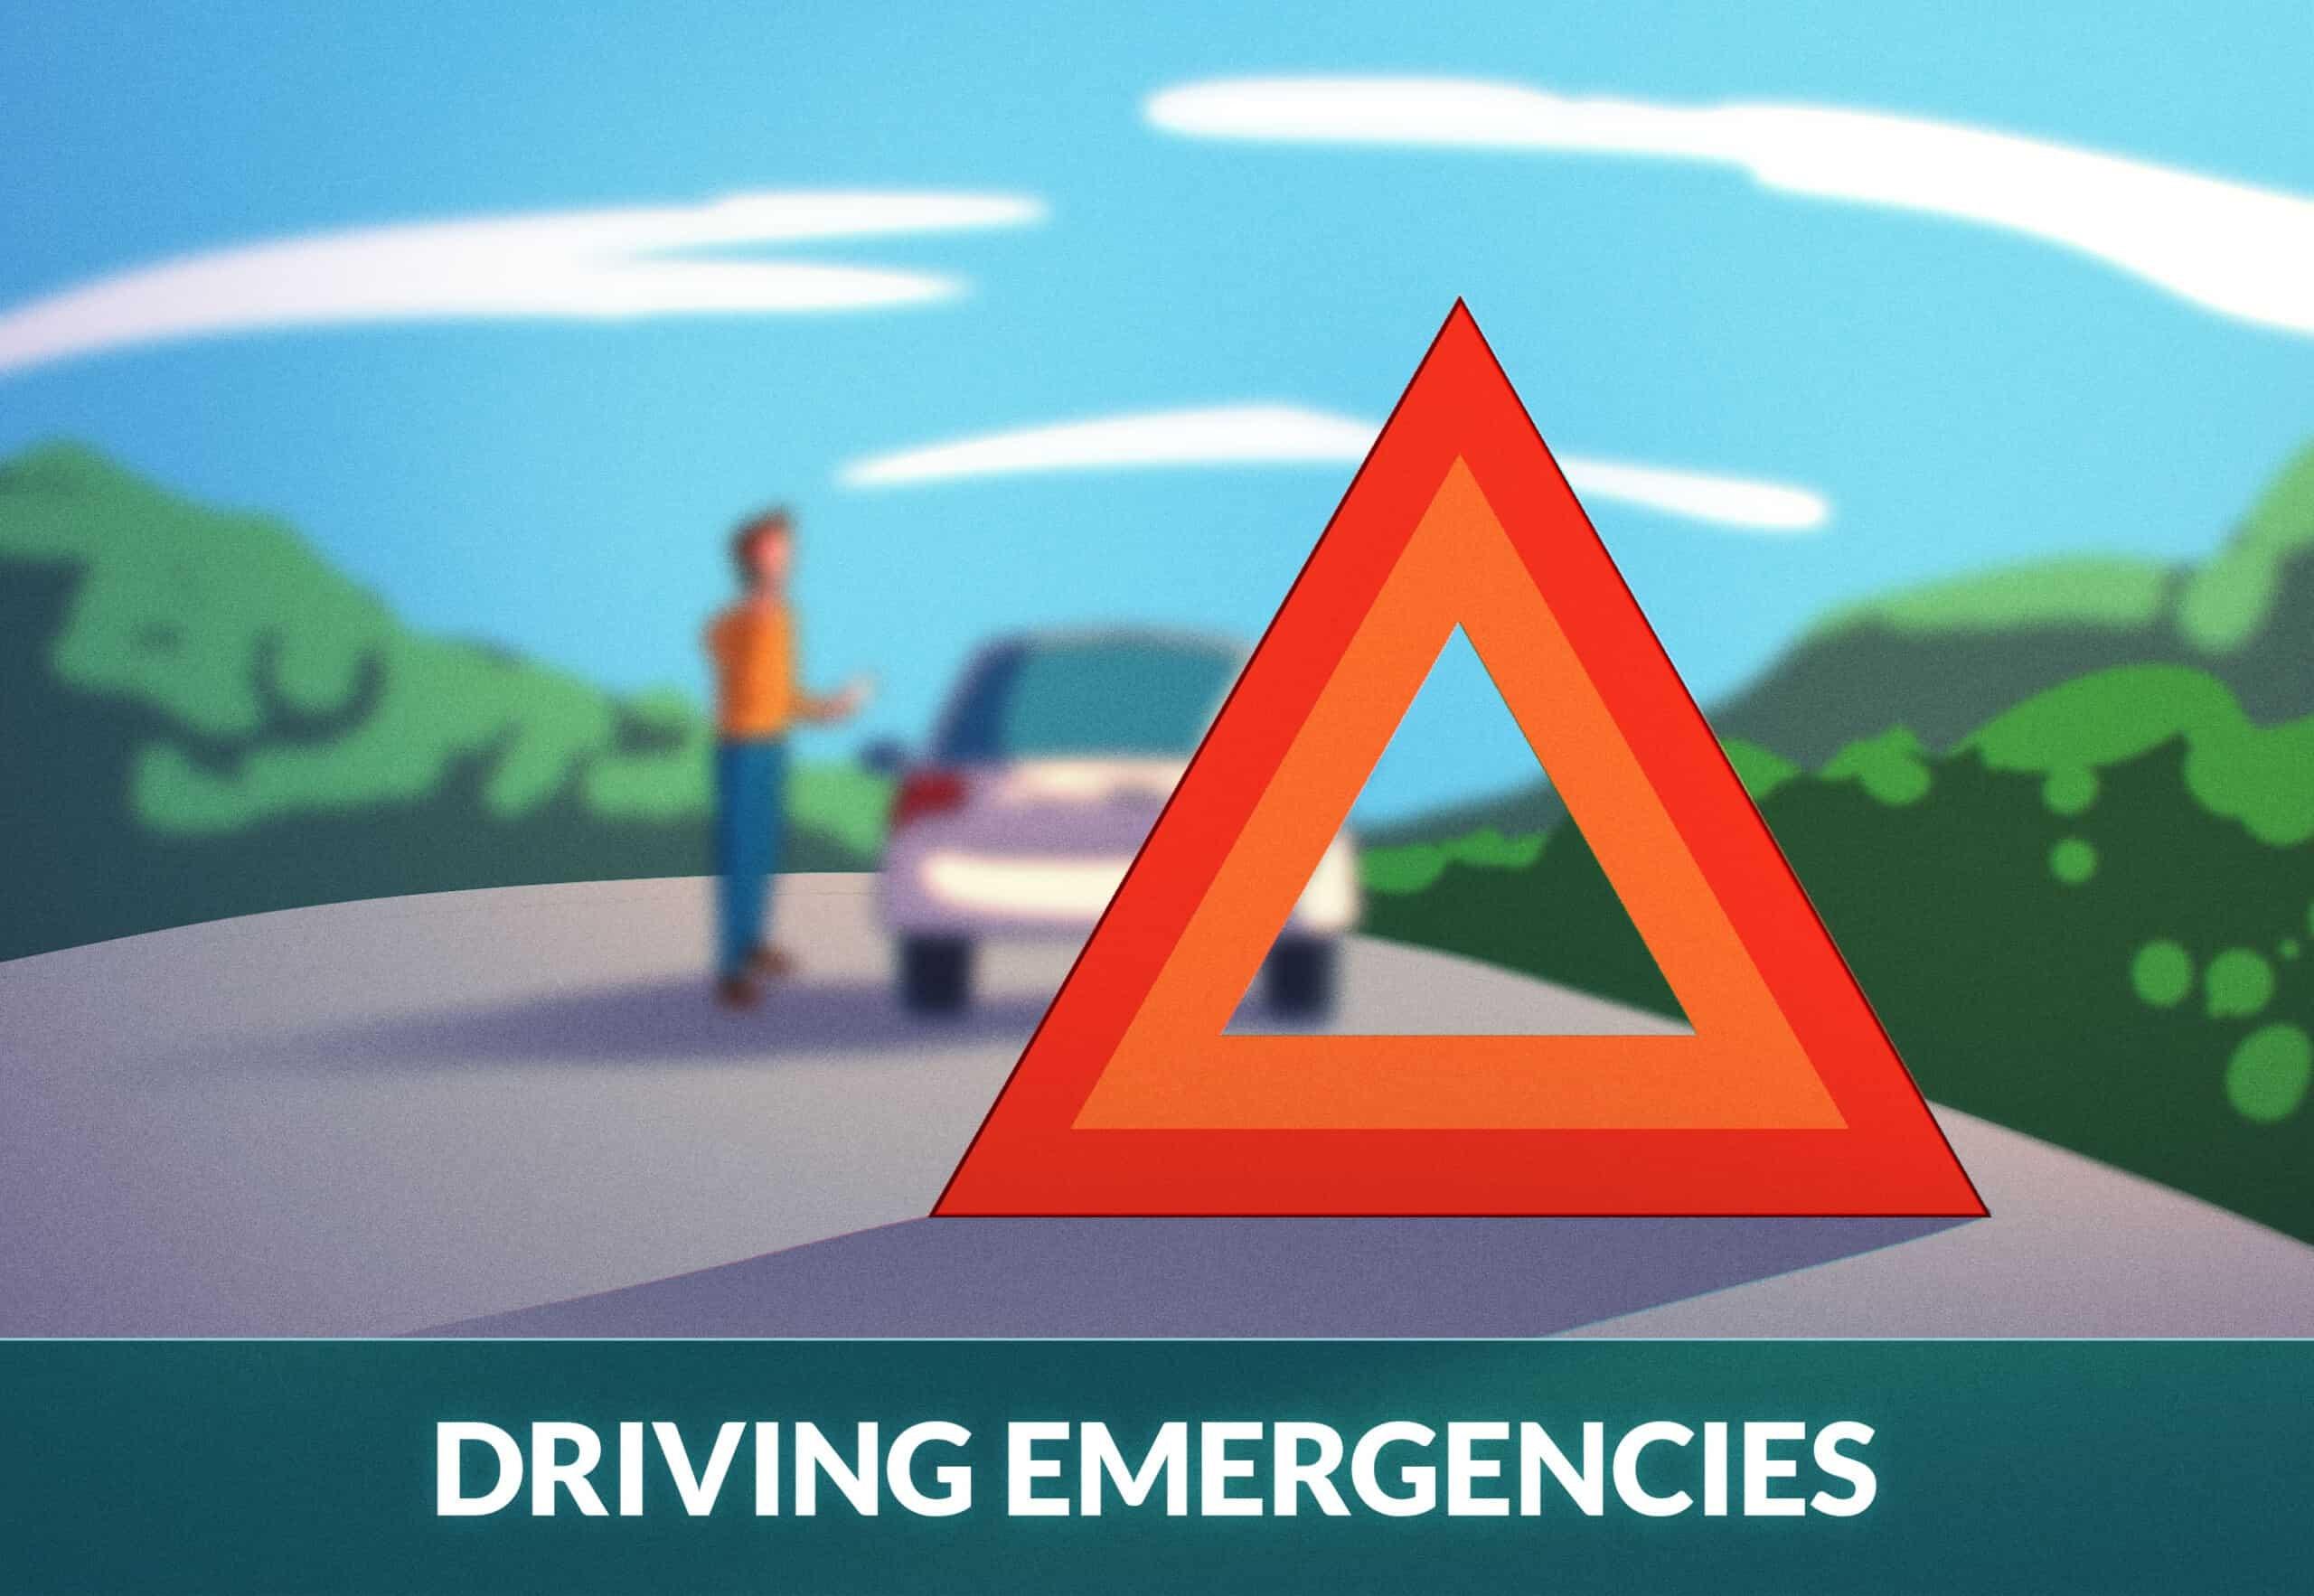 Driving Emergencies